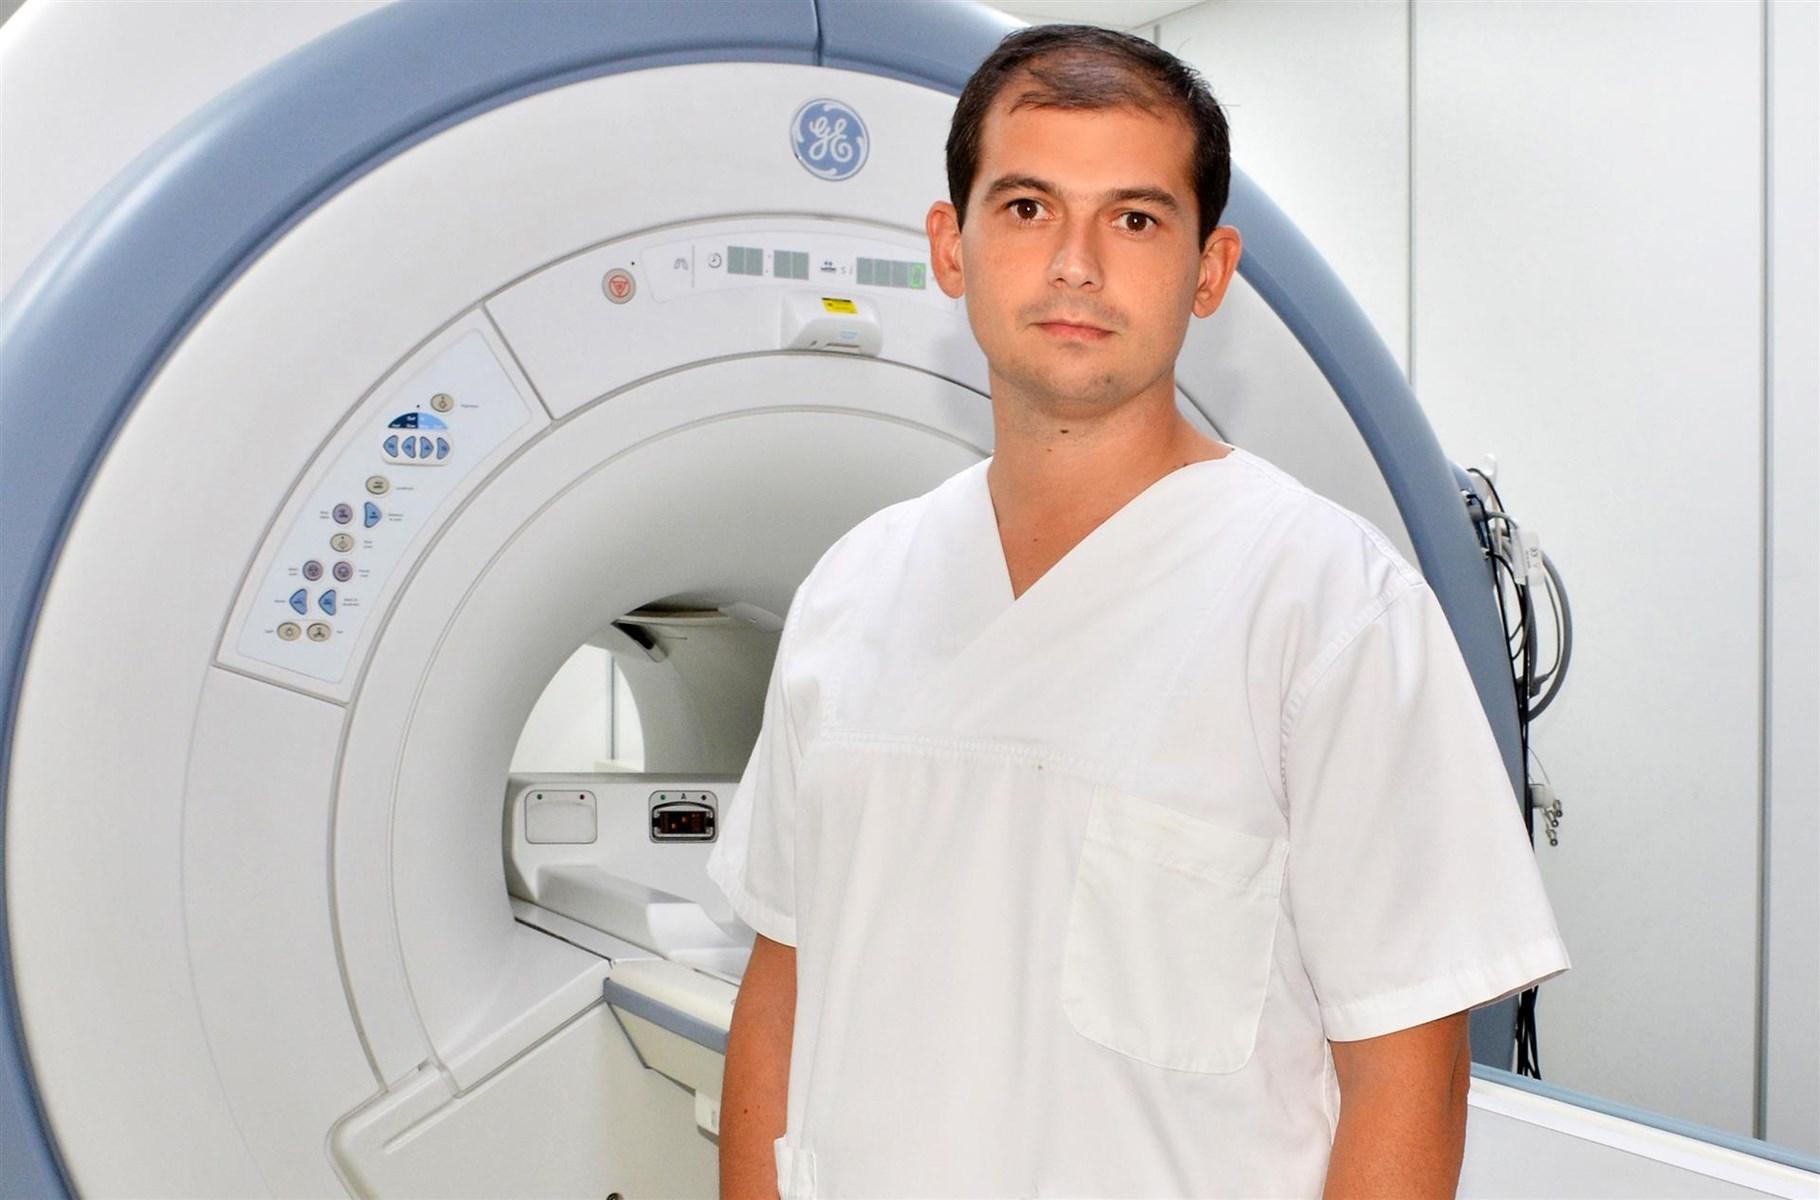 Светозар Столески - Радиолошки технолог